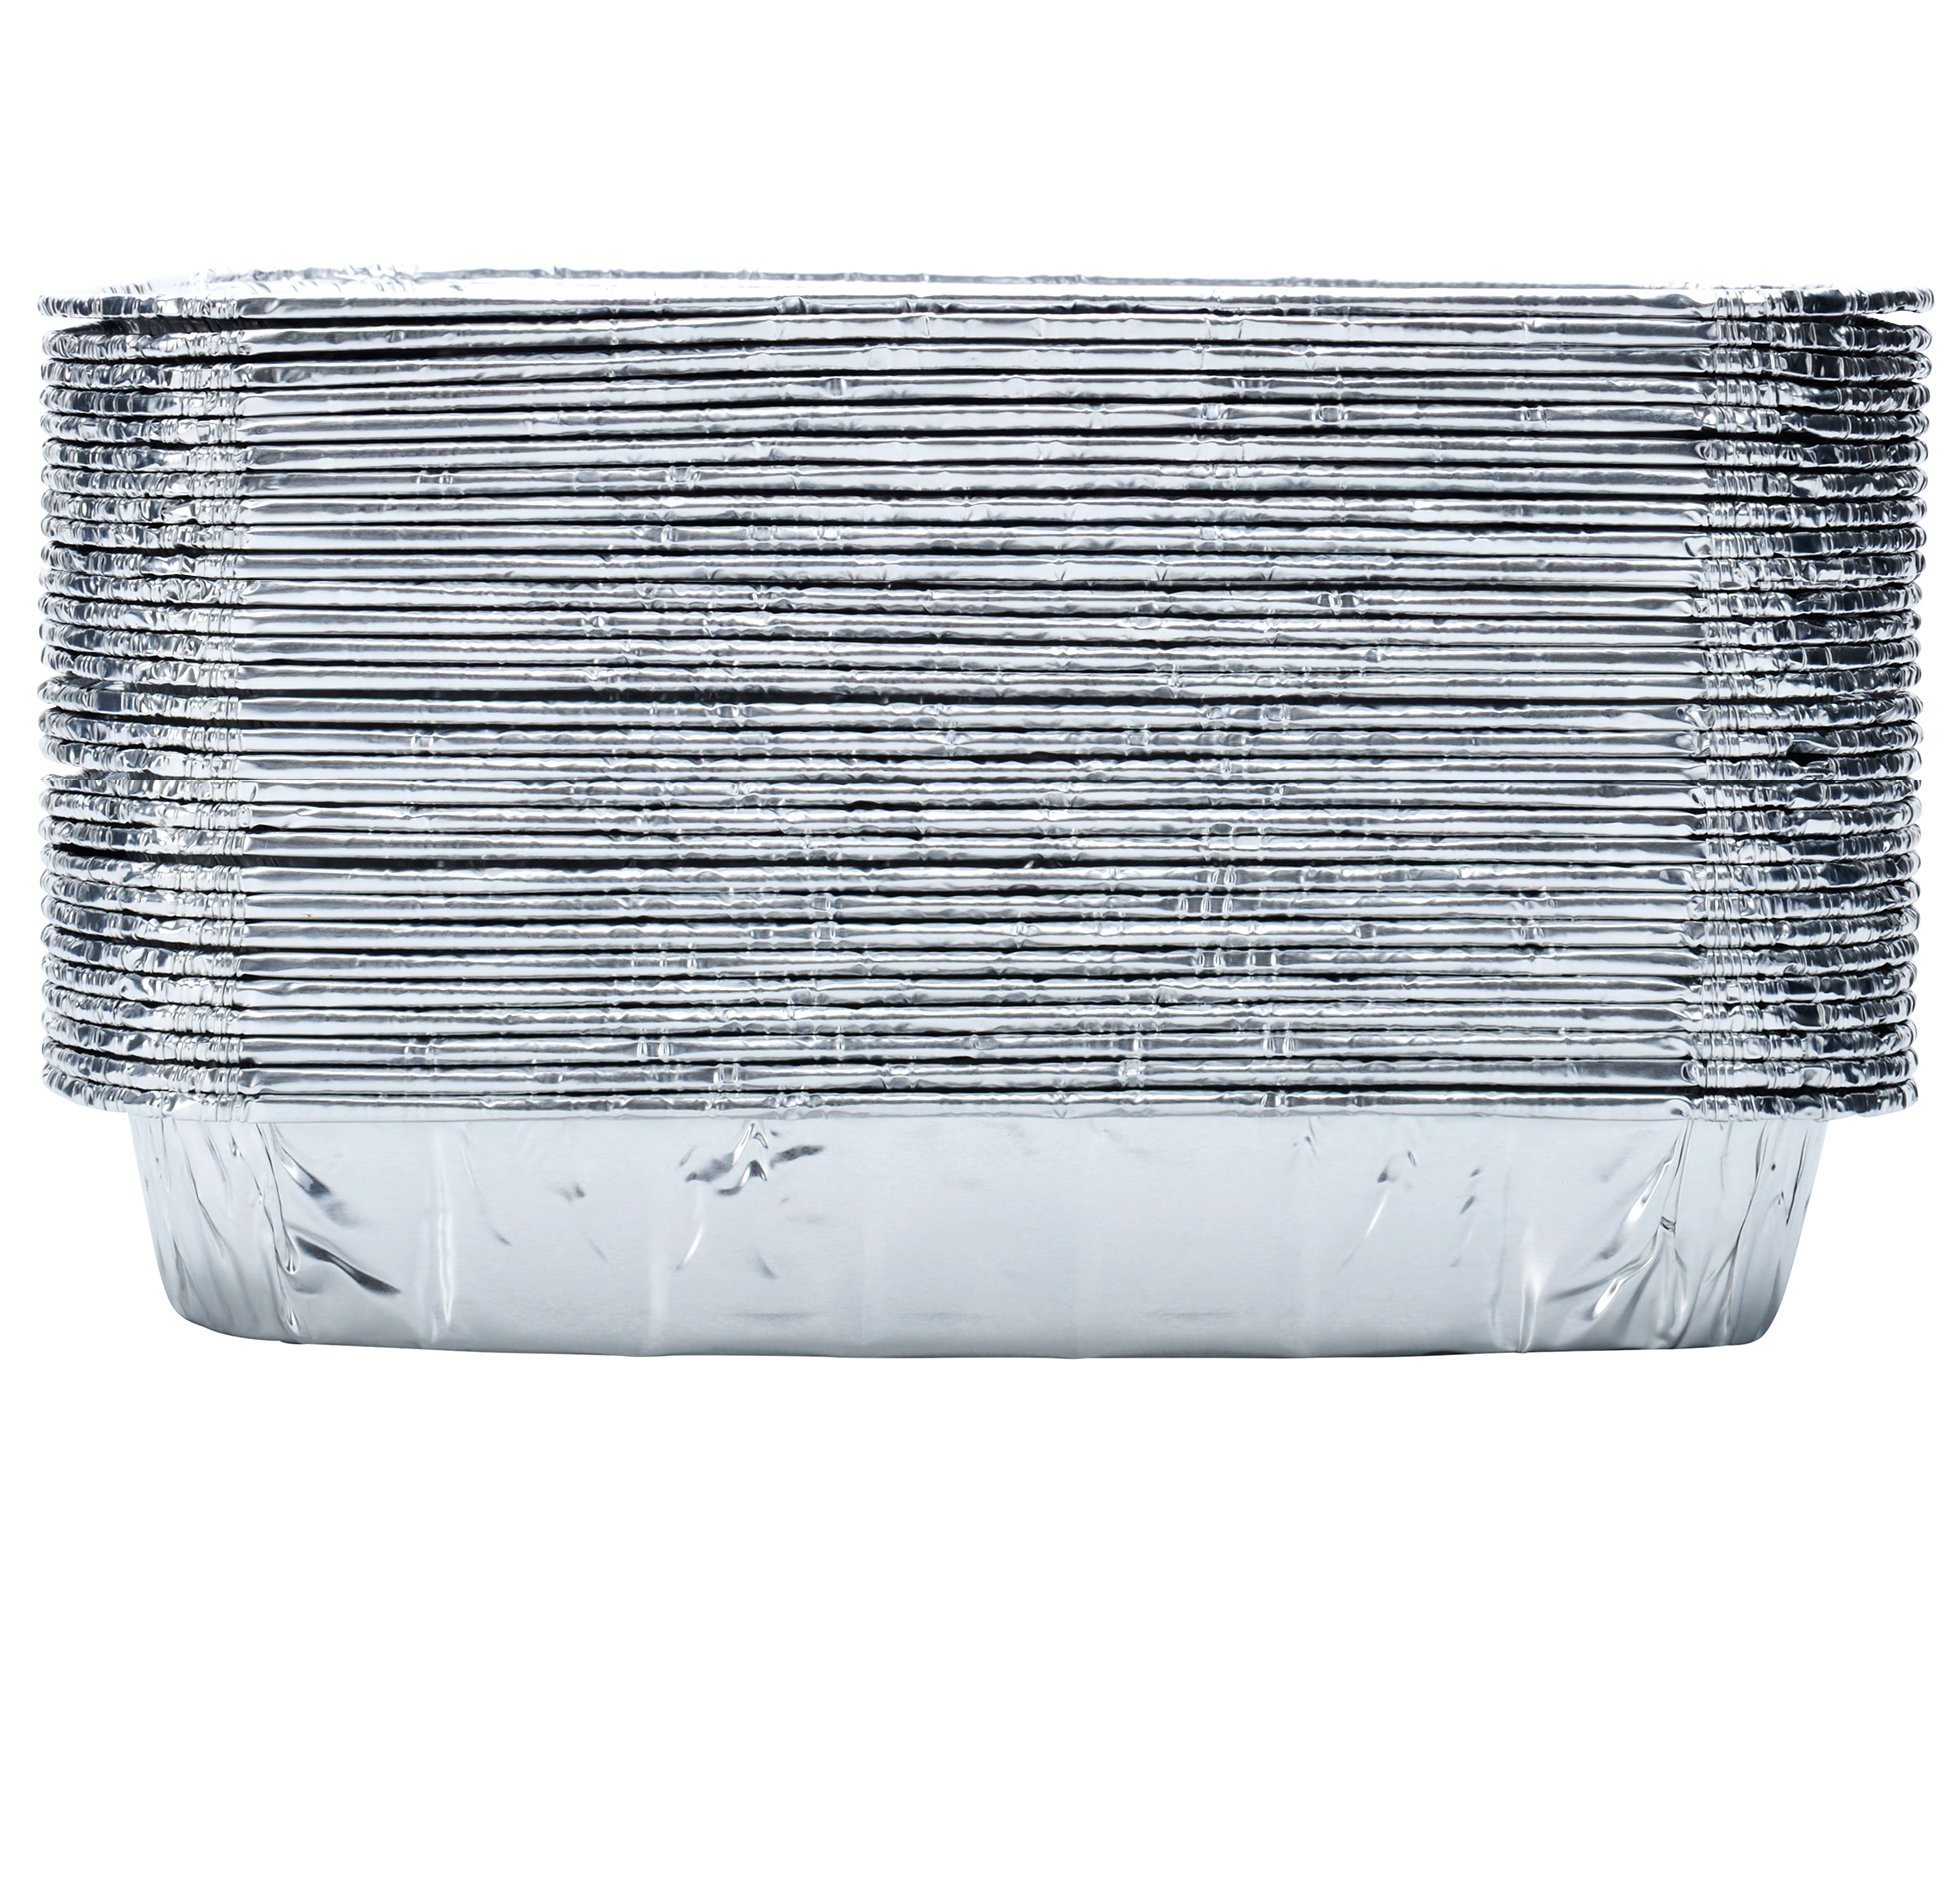 DOBI (30-Pack) Weber Grills Compatible Drip Pans, Bulk Package, Aluminum Foil BBQ Grease Pans, 7.5'' x 5'' by DOBI (Image #5)